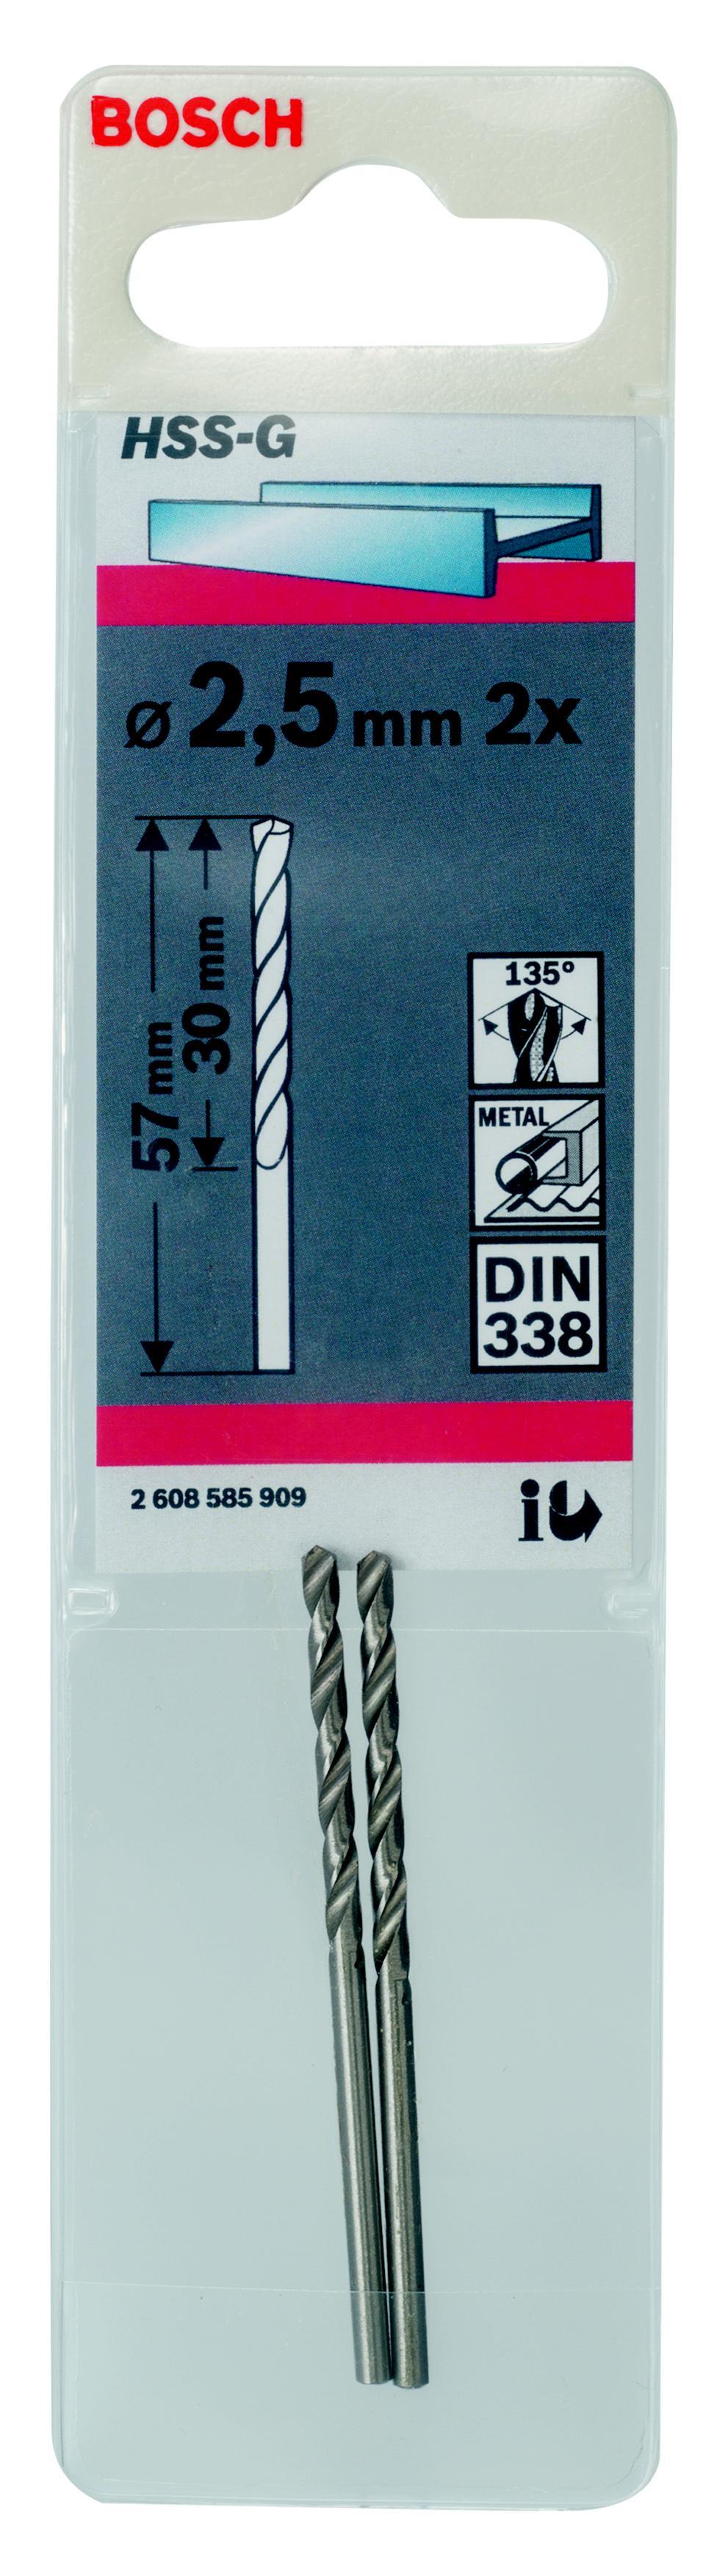 Сверло по металлу Bosch Hss-g standardline1.5 мм (2.608.585.909) пила дисковая bosch gks 55 g 601682000